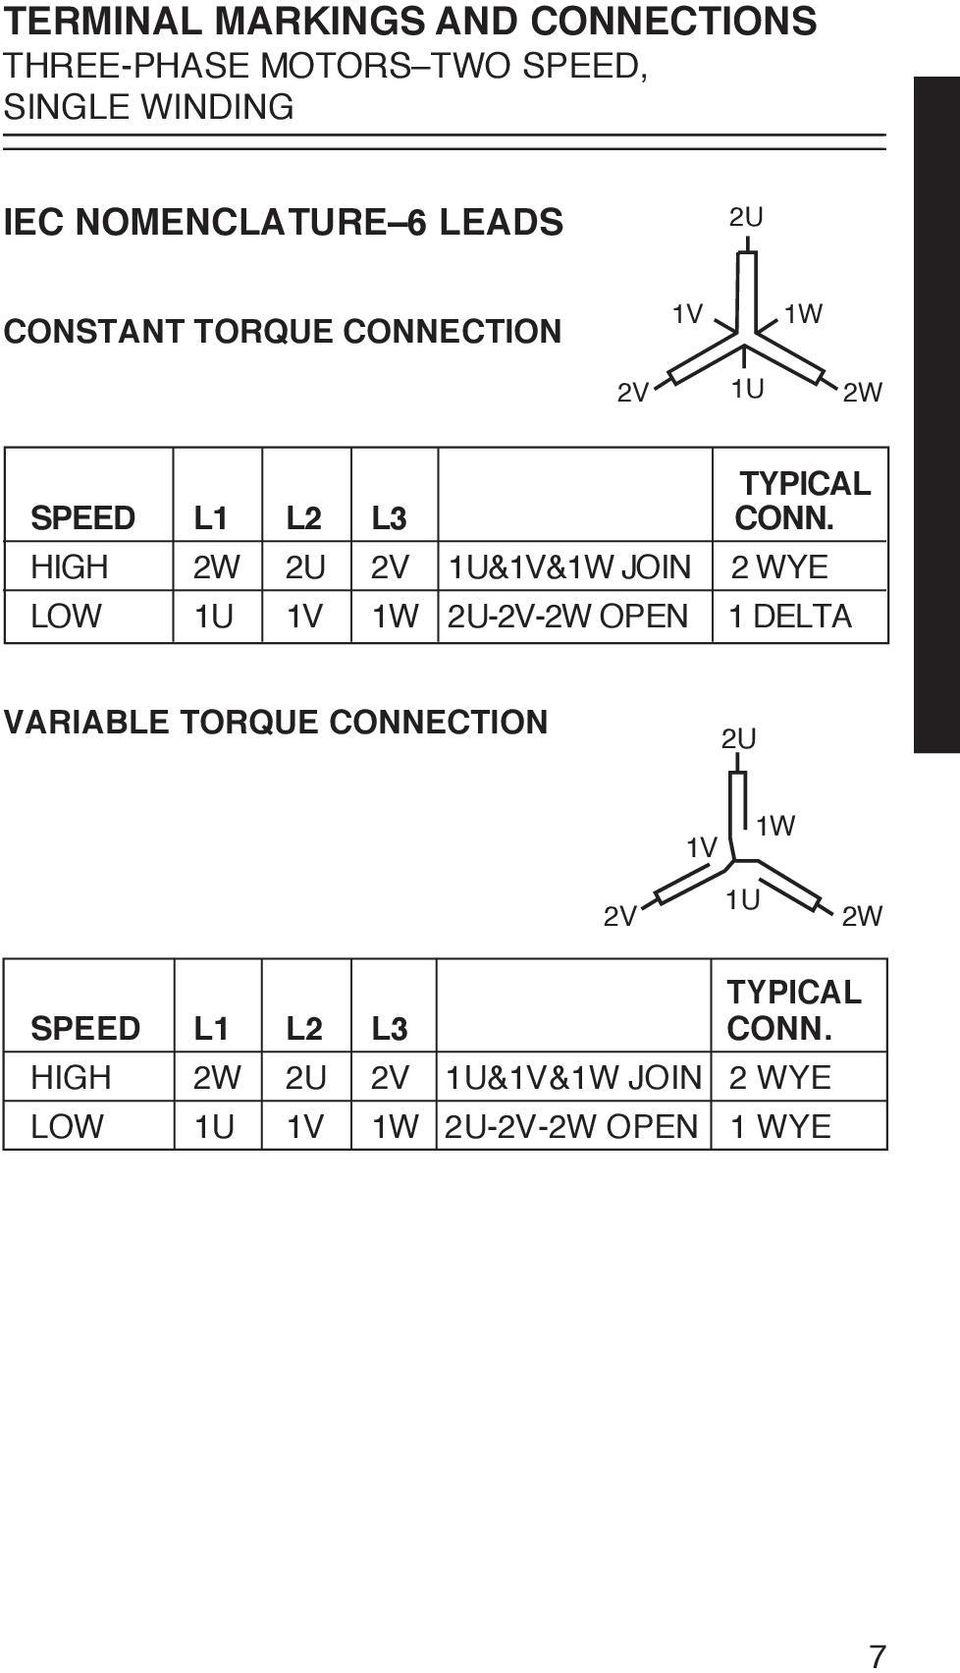 hight resolution of high w u v u v w join wye low u v w u v w open delta variable torque connection u v w